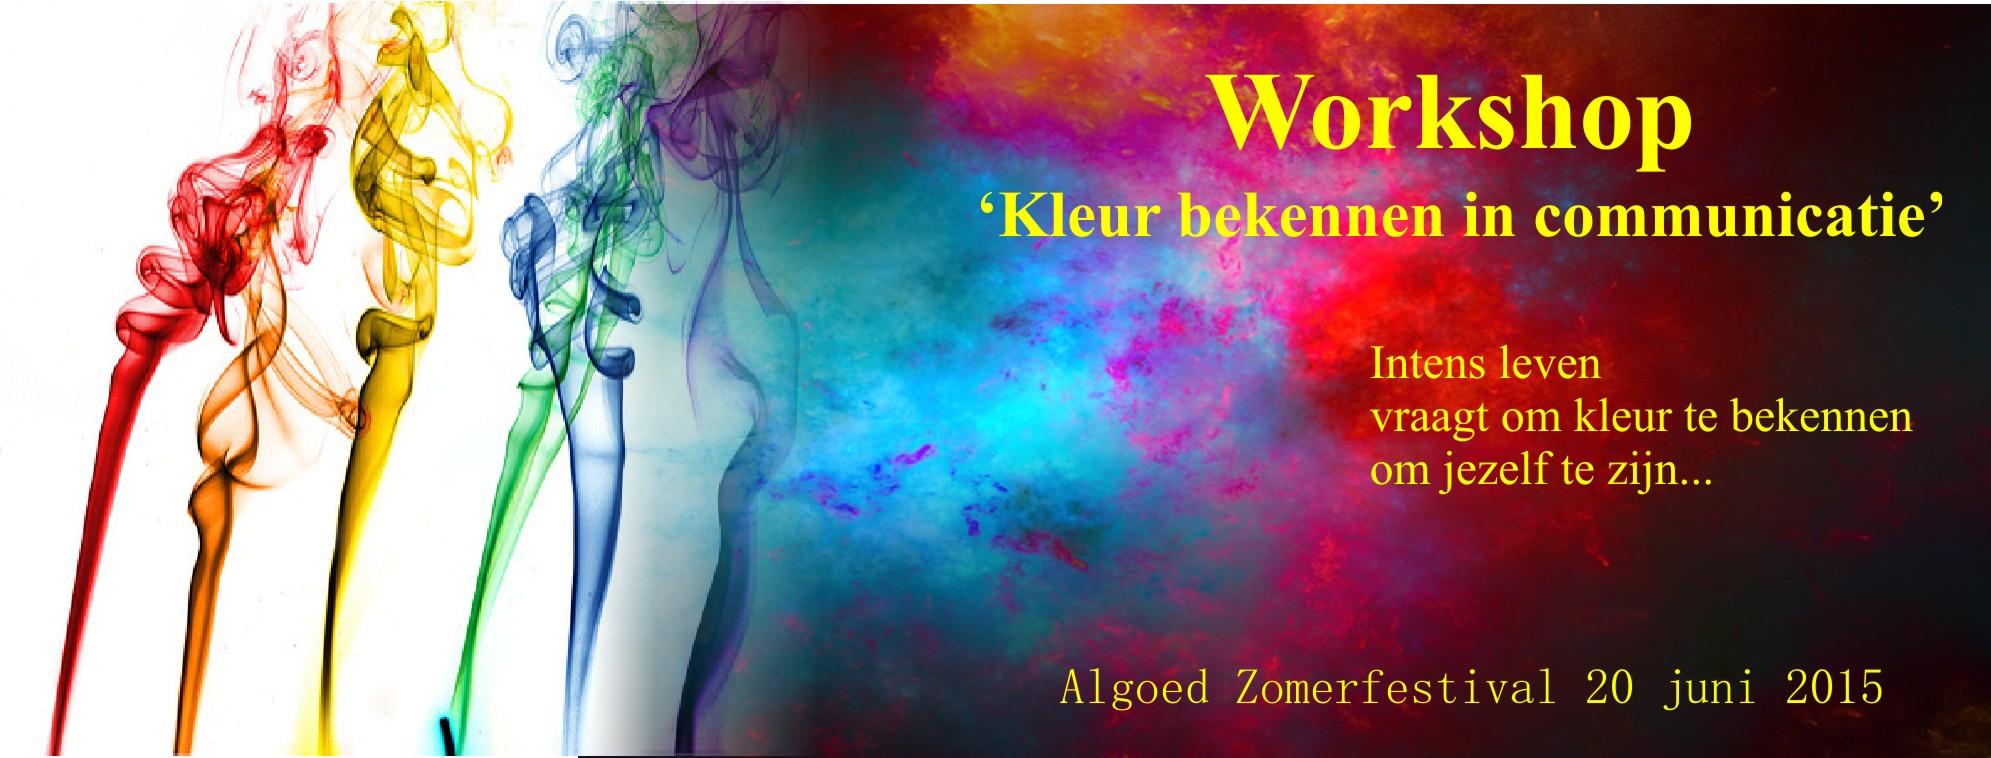 Kleur bekennen - Kleur harmonie leven ...